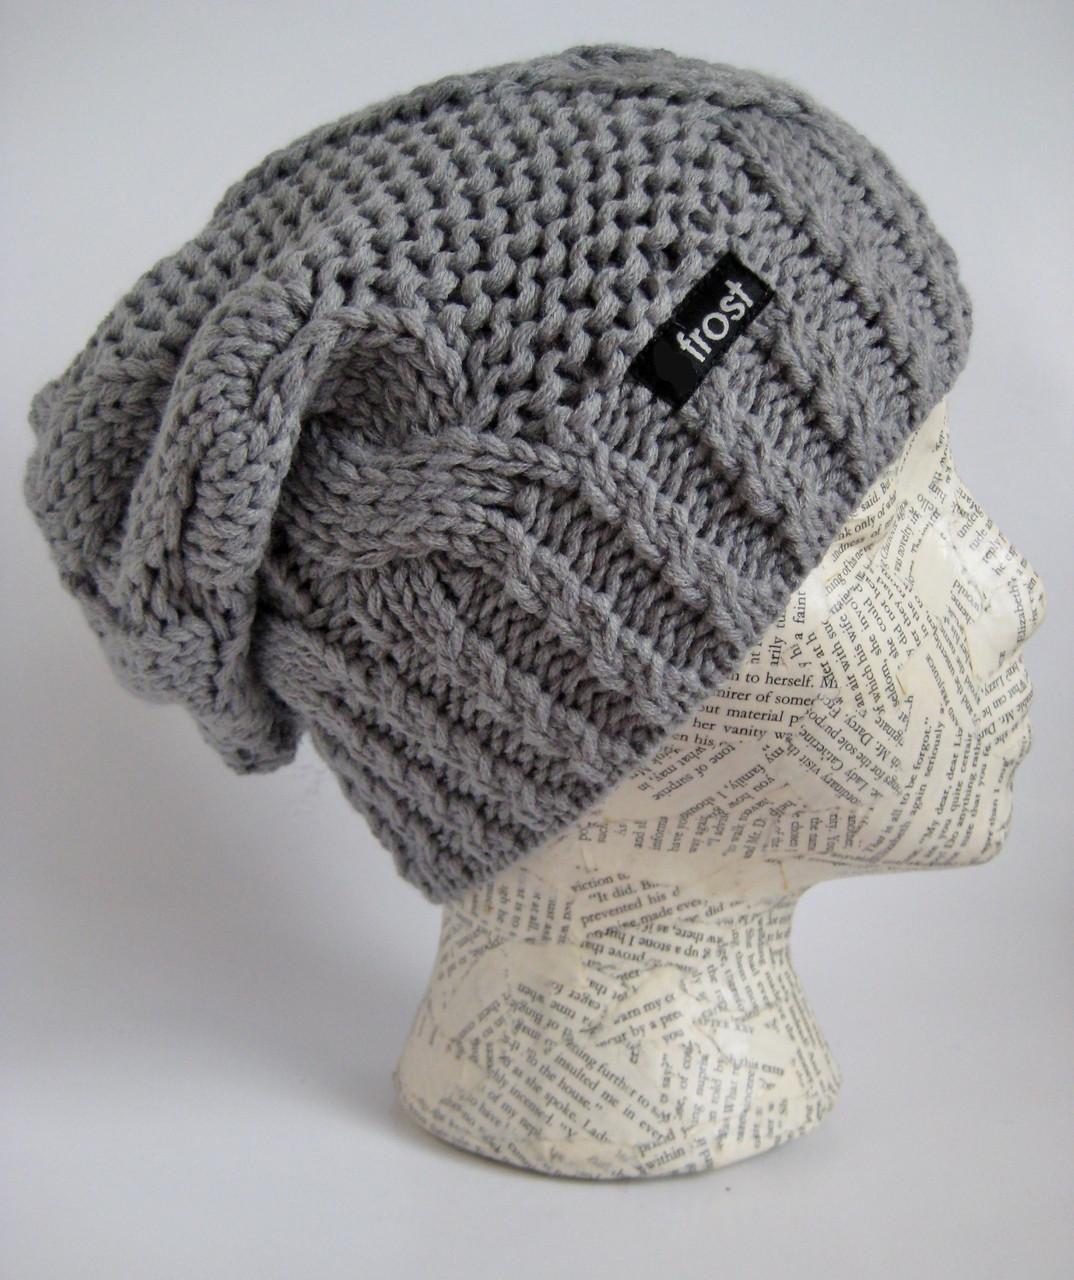 c145c6d5e5f2a Slouchy hat for women  Winter beanie  Designer winter hat  Frost Hats